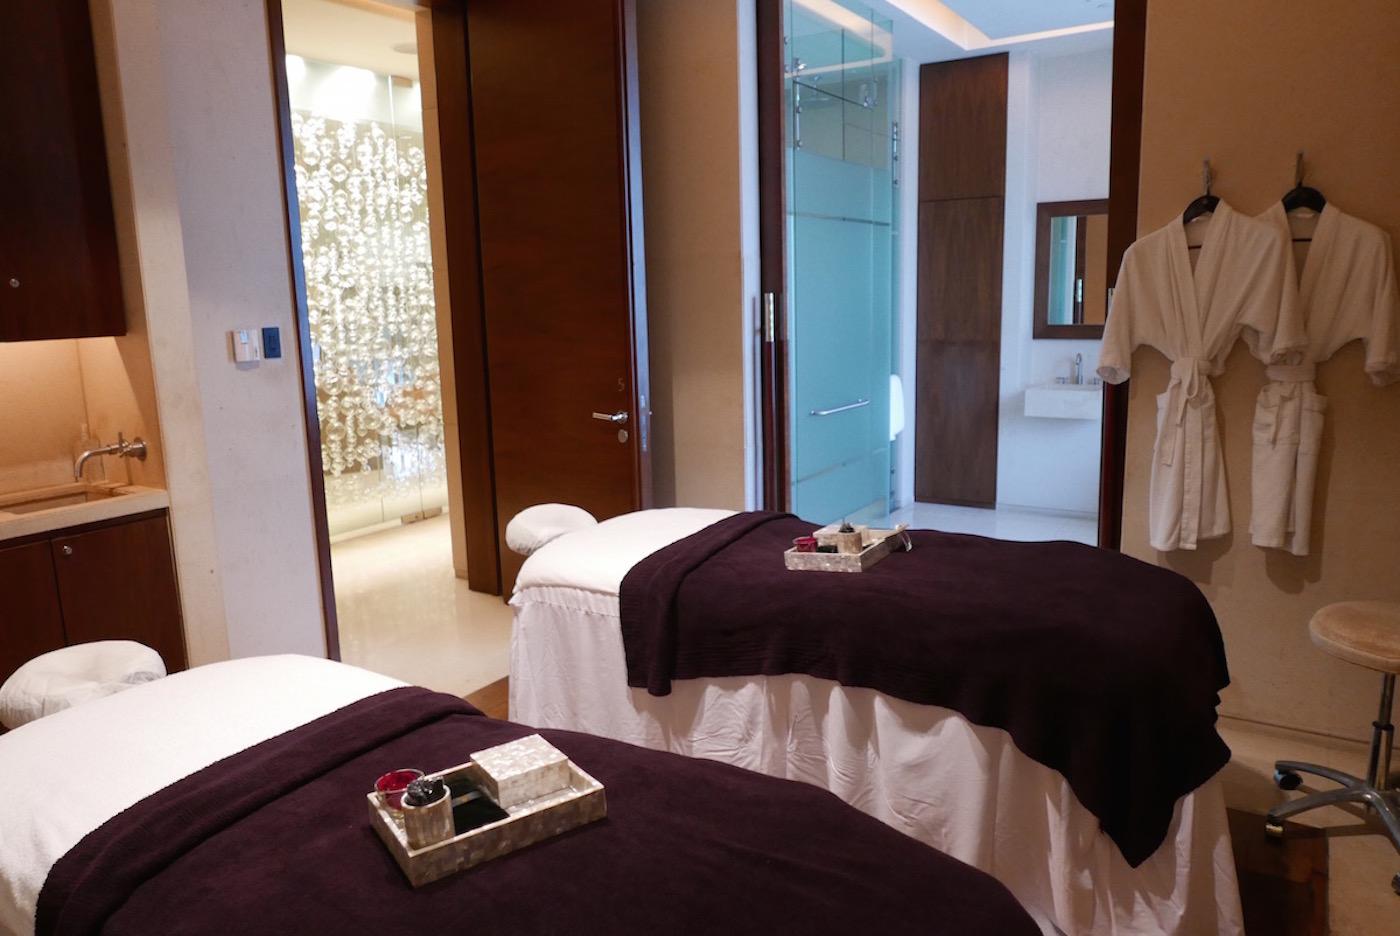 st-regis-singapore-luxury-hotel-review-19